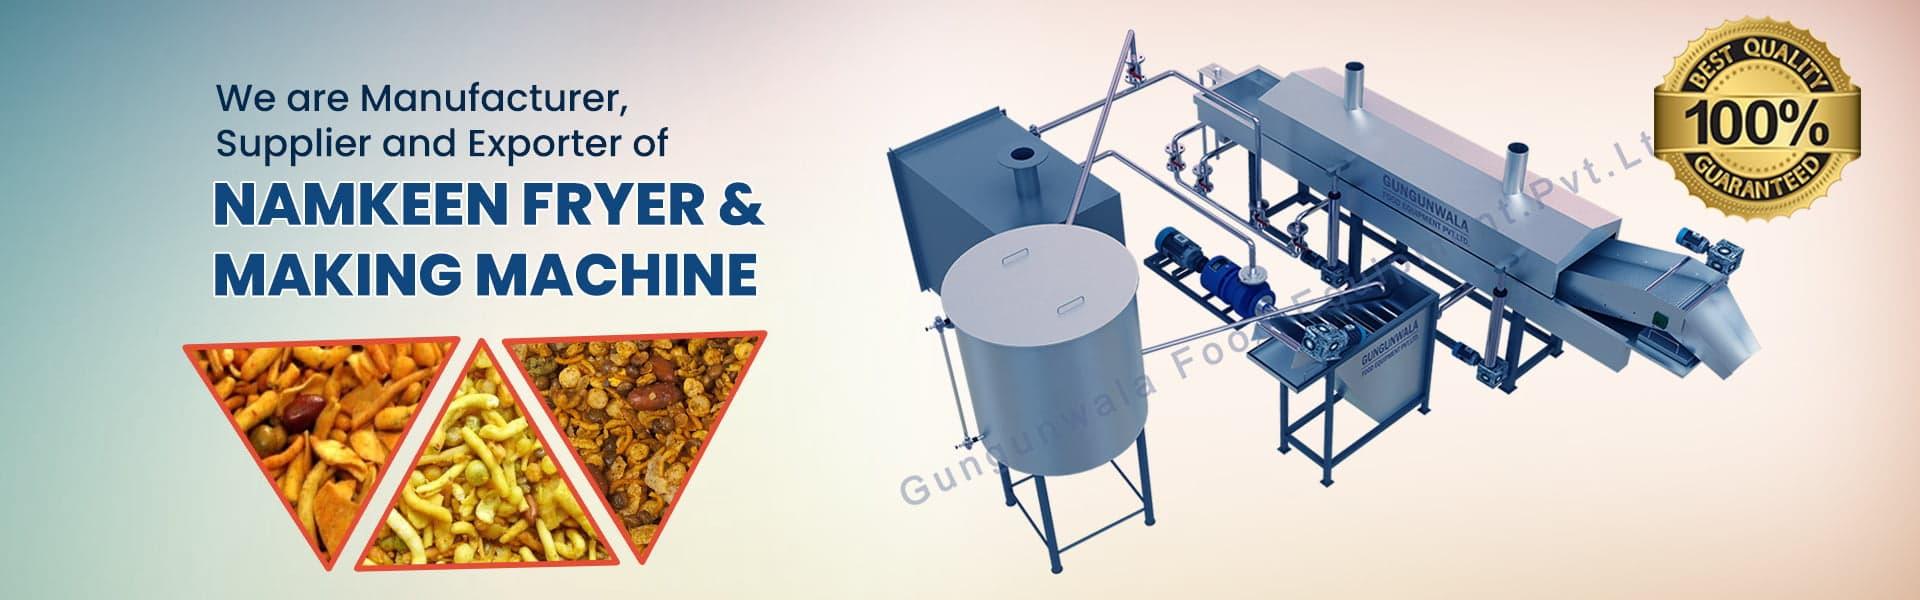 Manufacturer & Supplier - Namkeen Fryer Making Machine in Gujarat, India